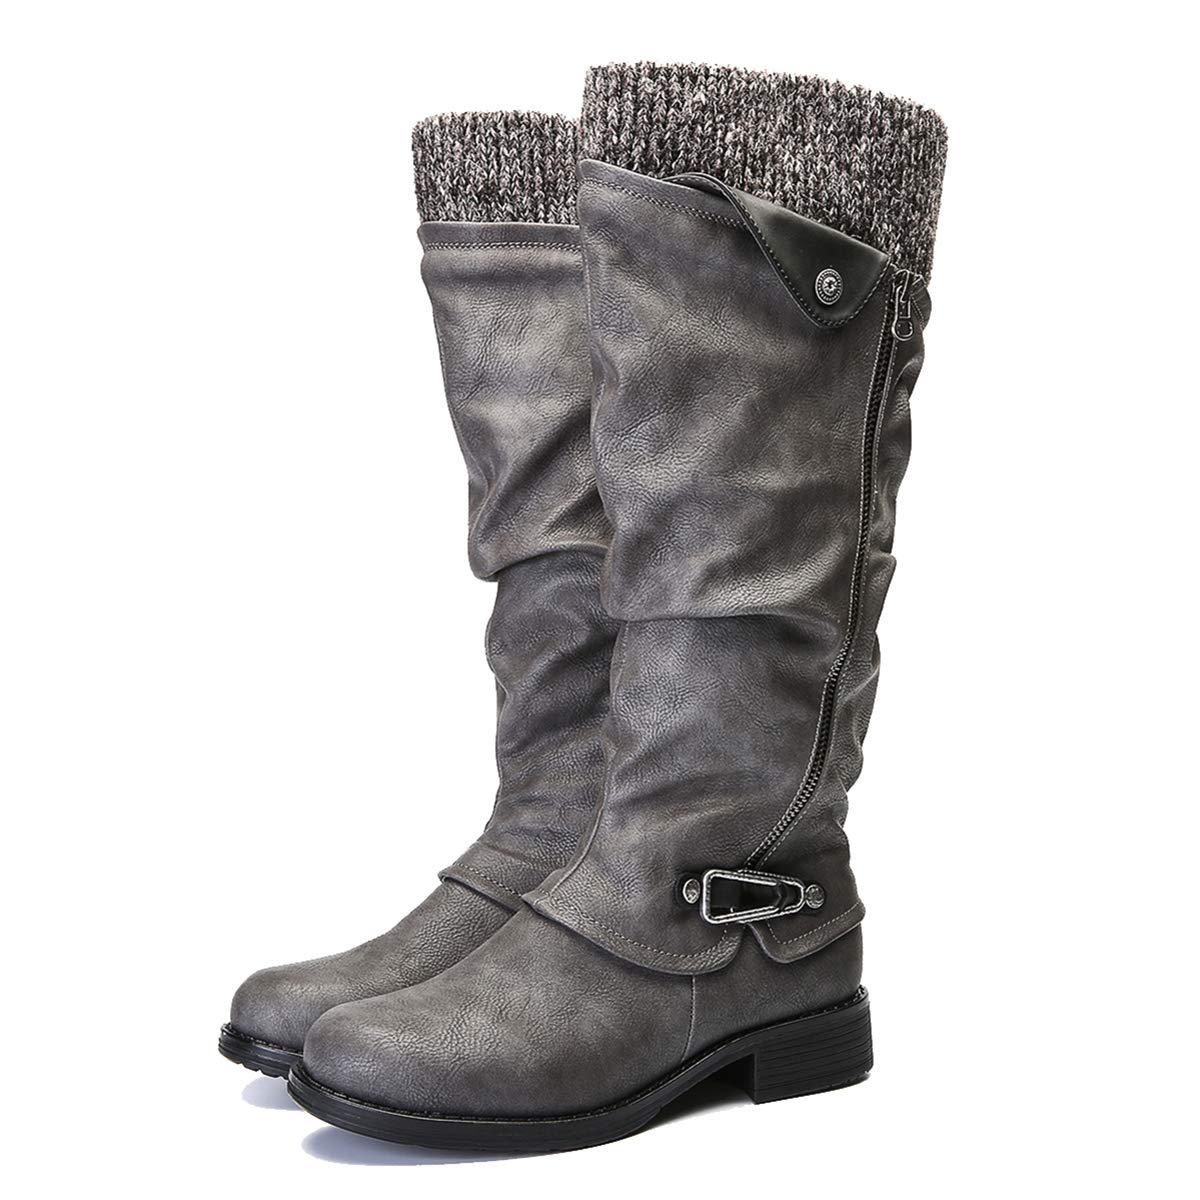 Converse bottes bottines fourrées cuir | Rakuten